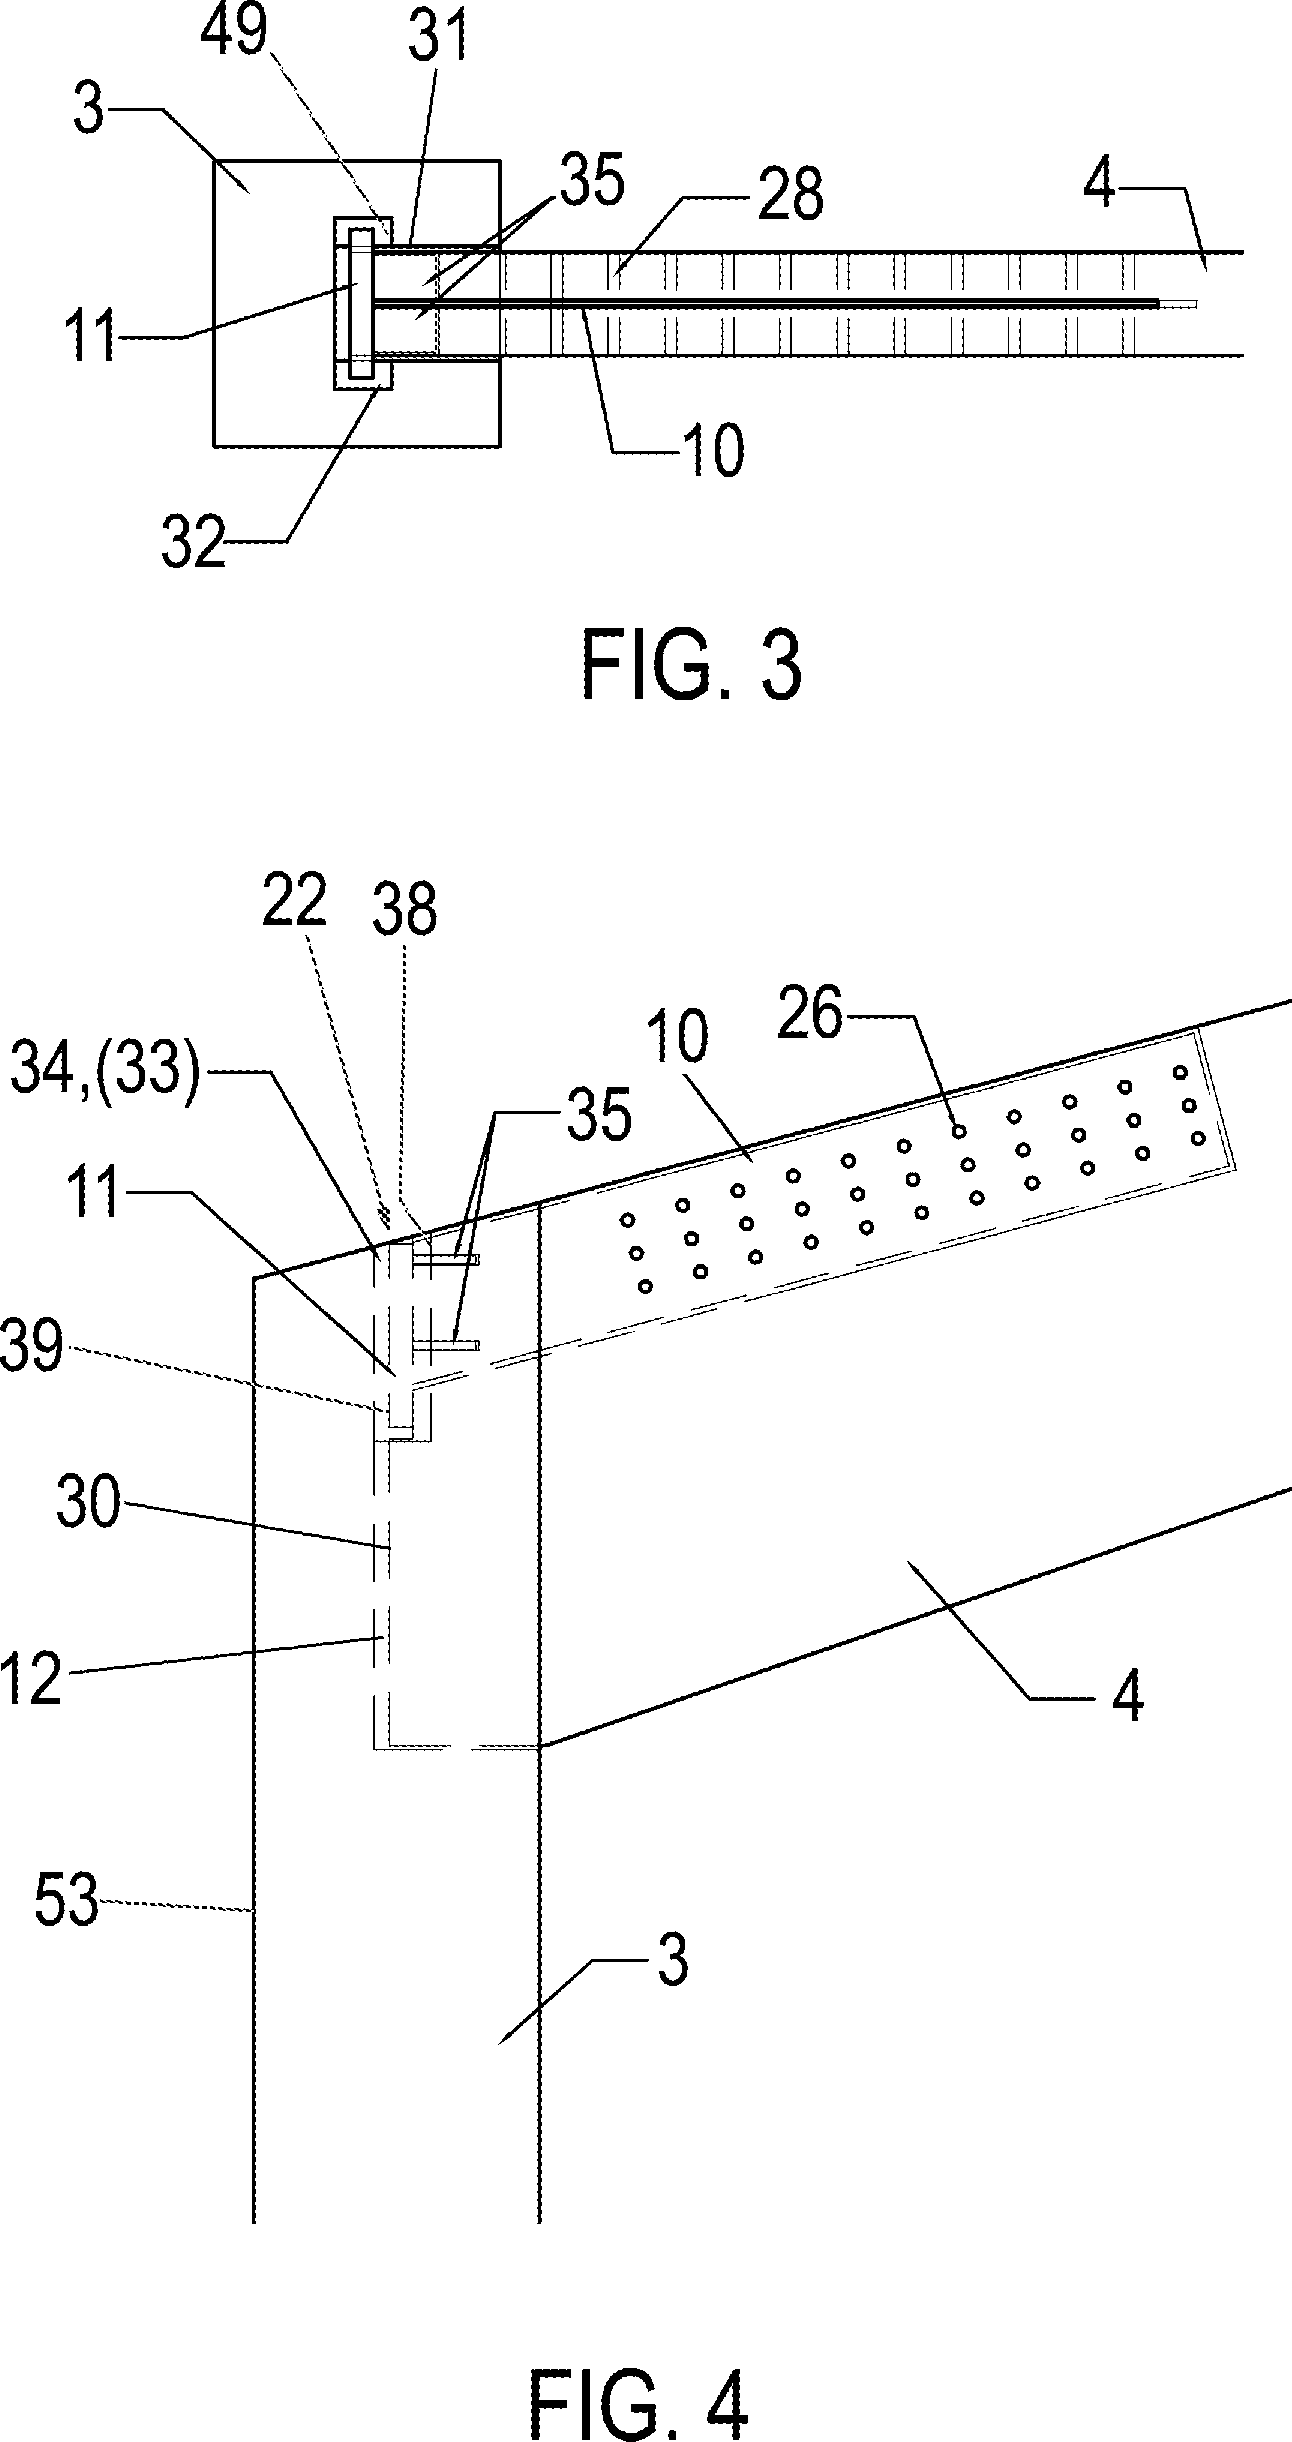 Patent de202011050816u1 halbrahmen f r dreigelenkrahmen for Biegesteifer rahmen